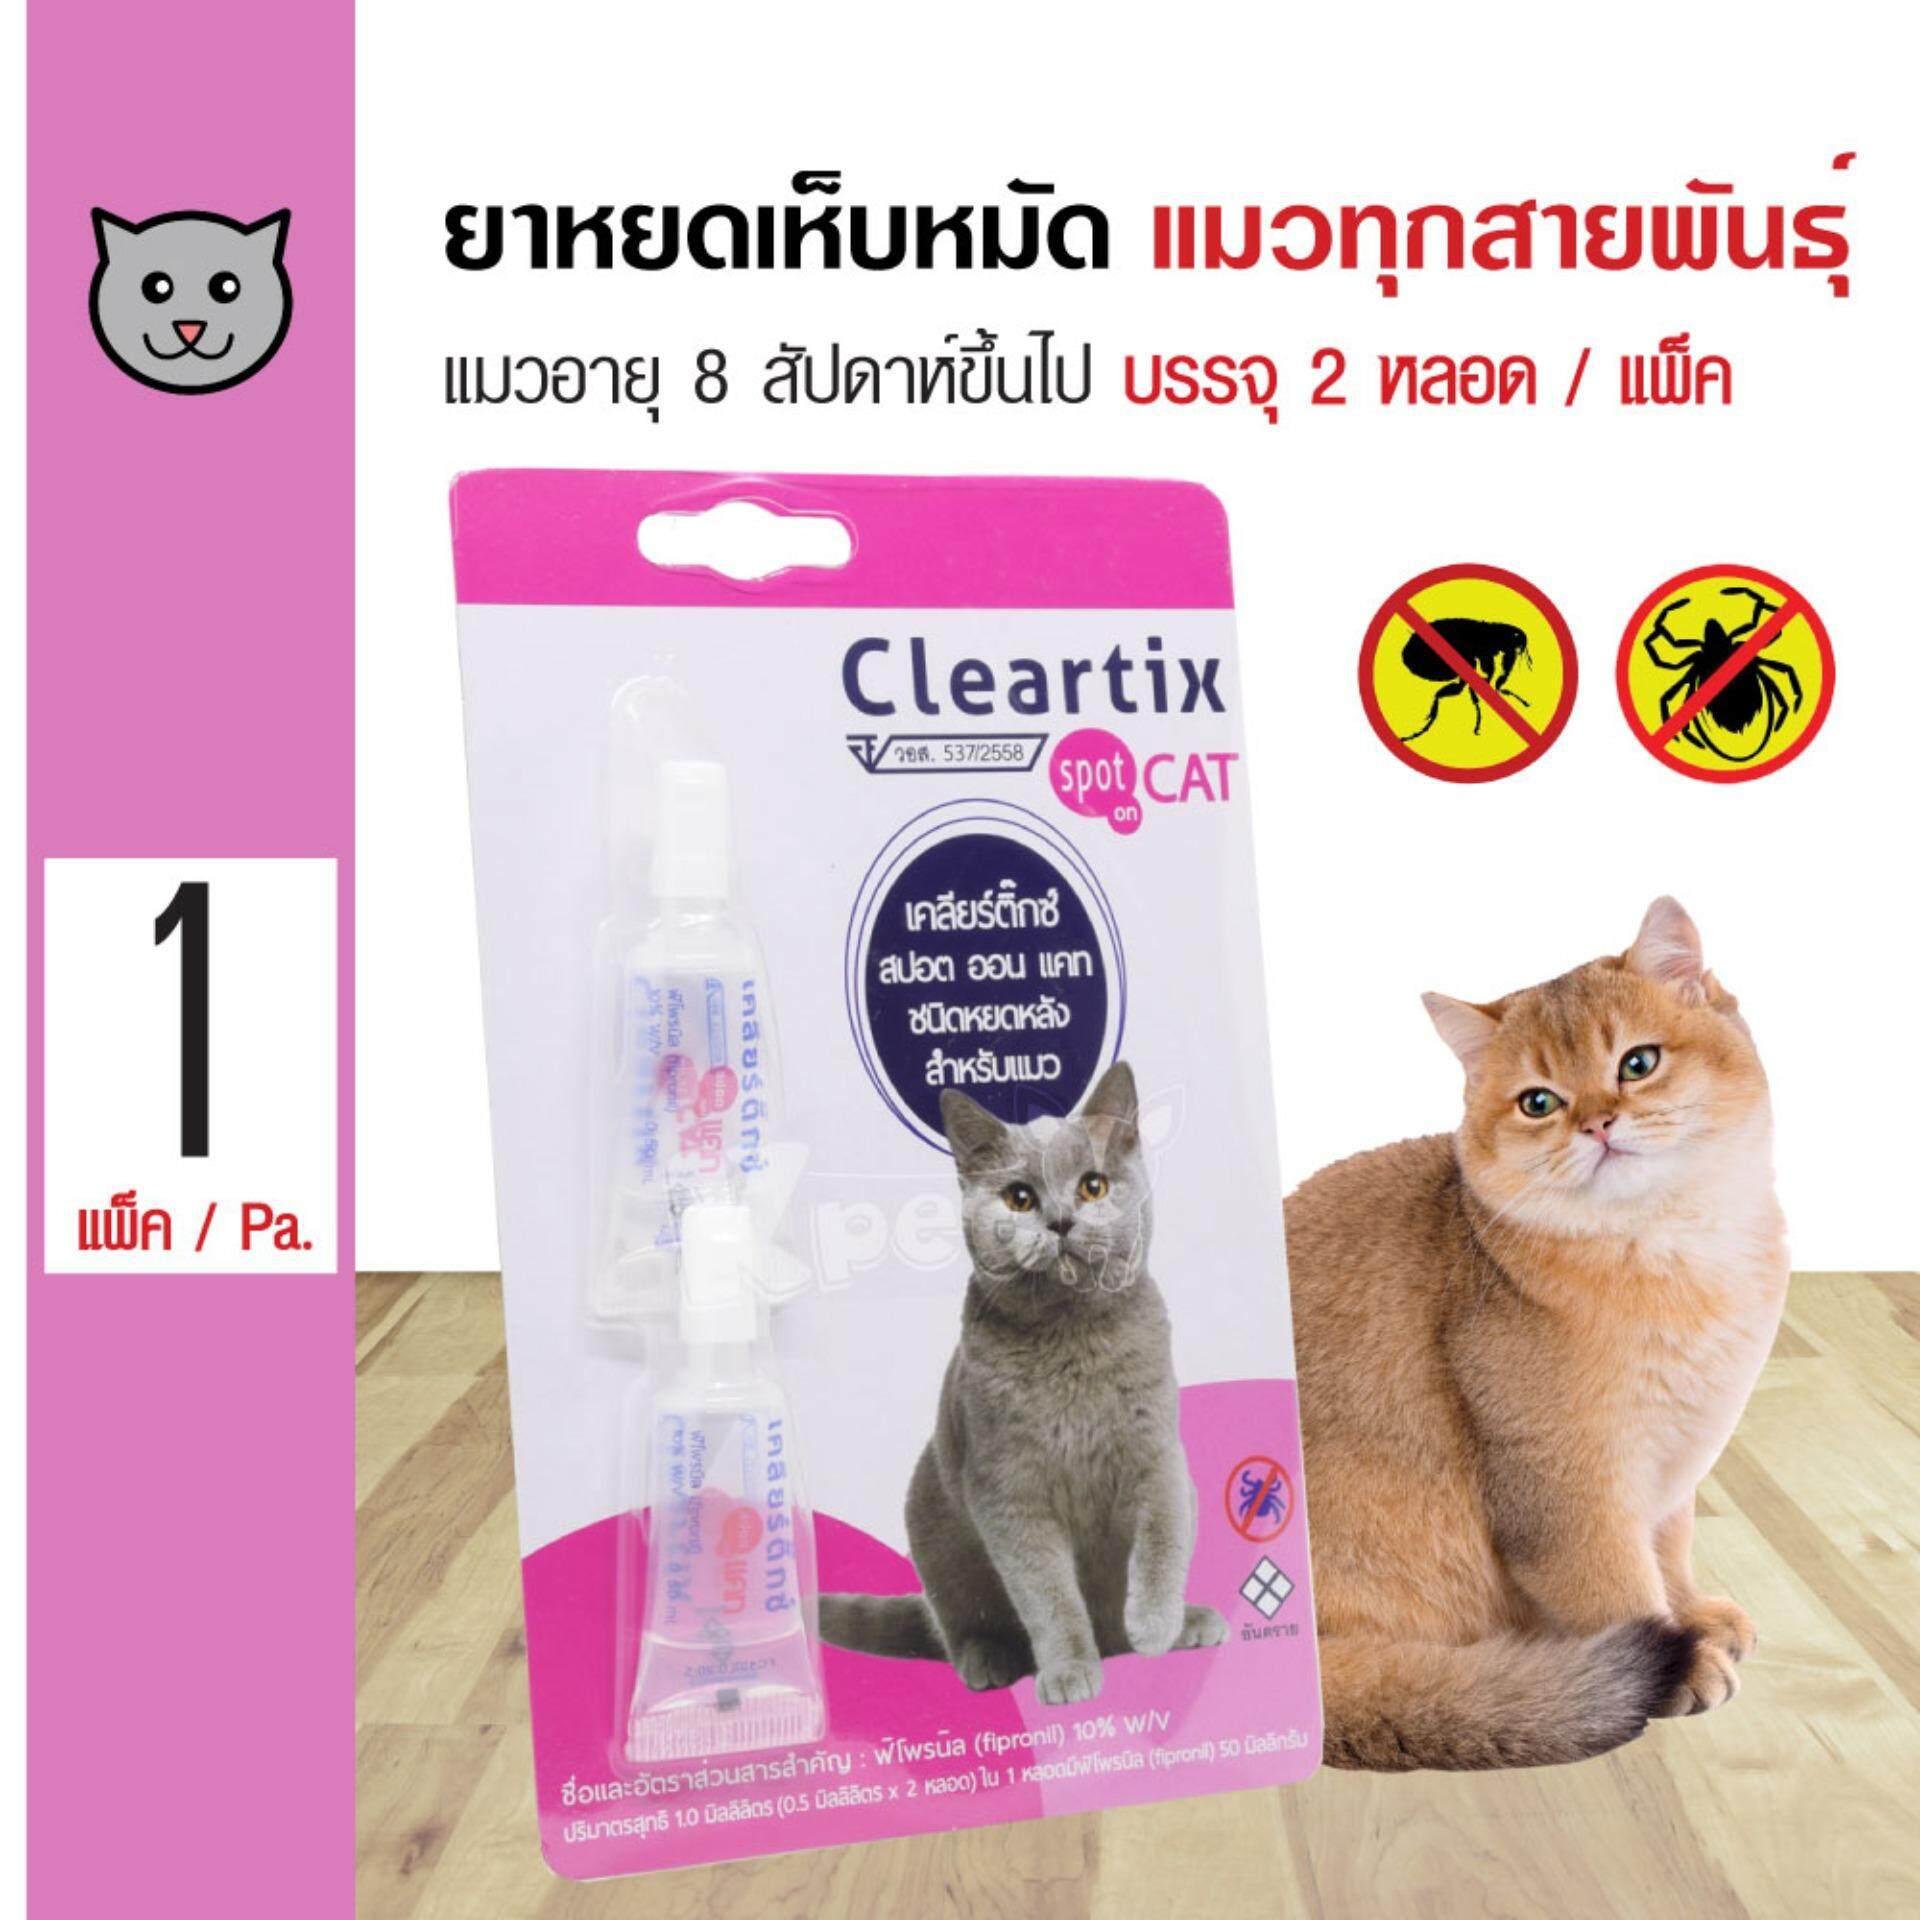 Cleartix Cat ยาหยอดหลัง ยาหยดเห็บหมัด สำหรับแมว อายุ 8 สัปดาห์ขึ้นไป (2 หลอด/ แพ็ค) By Kpet.